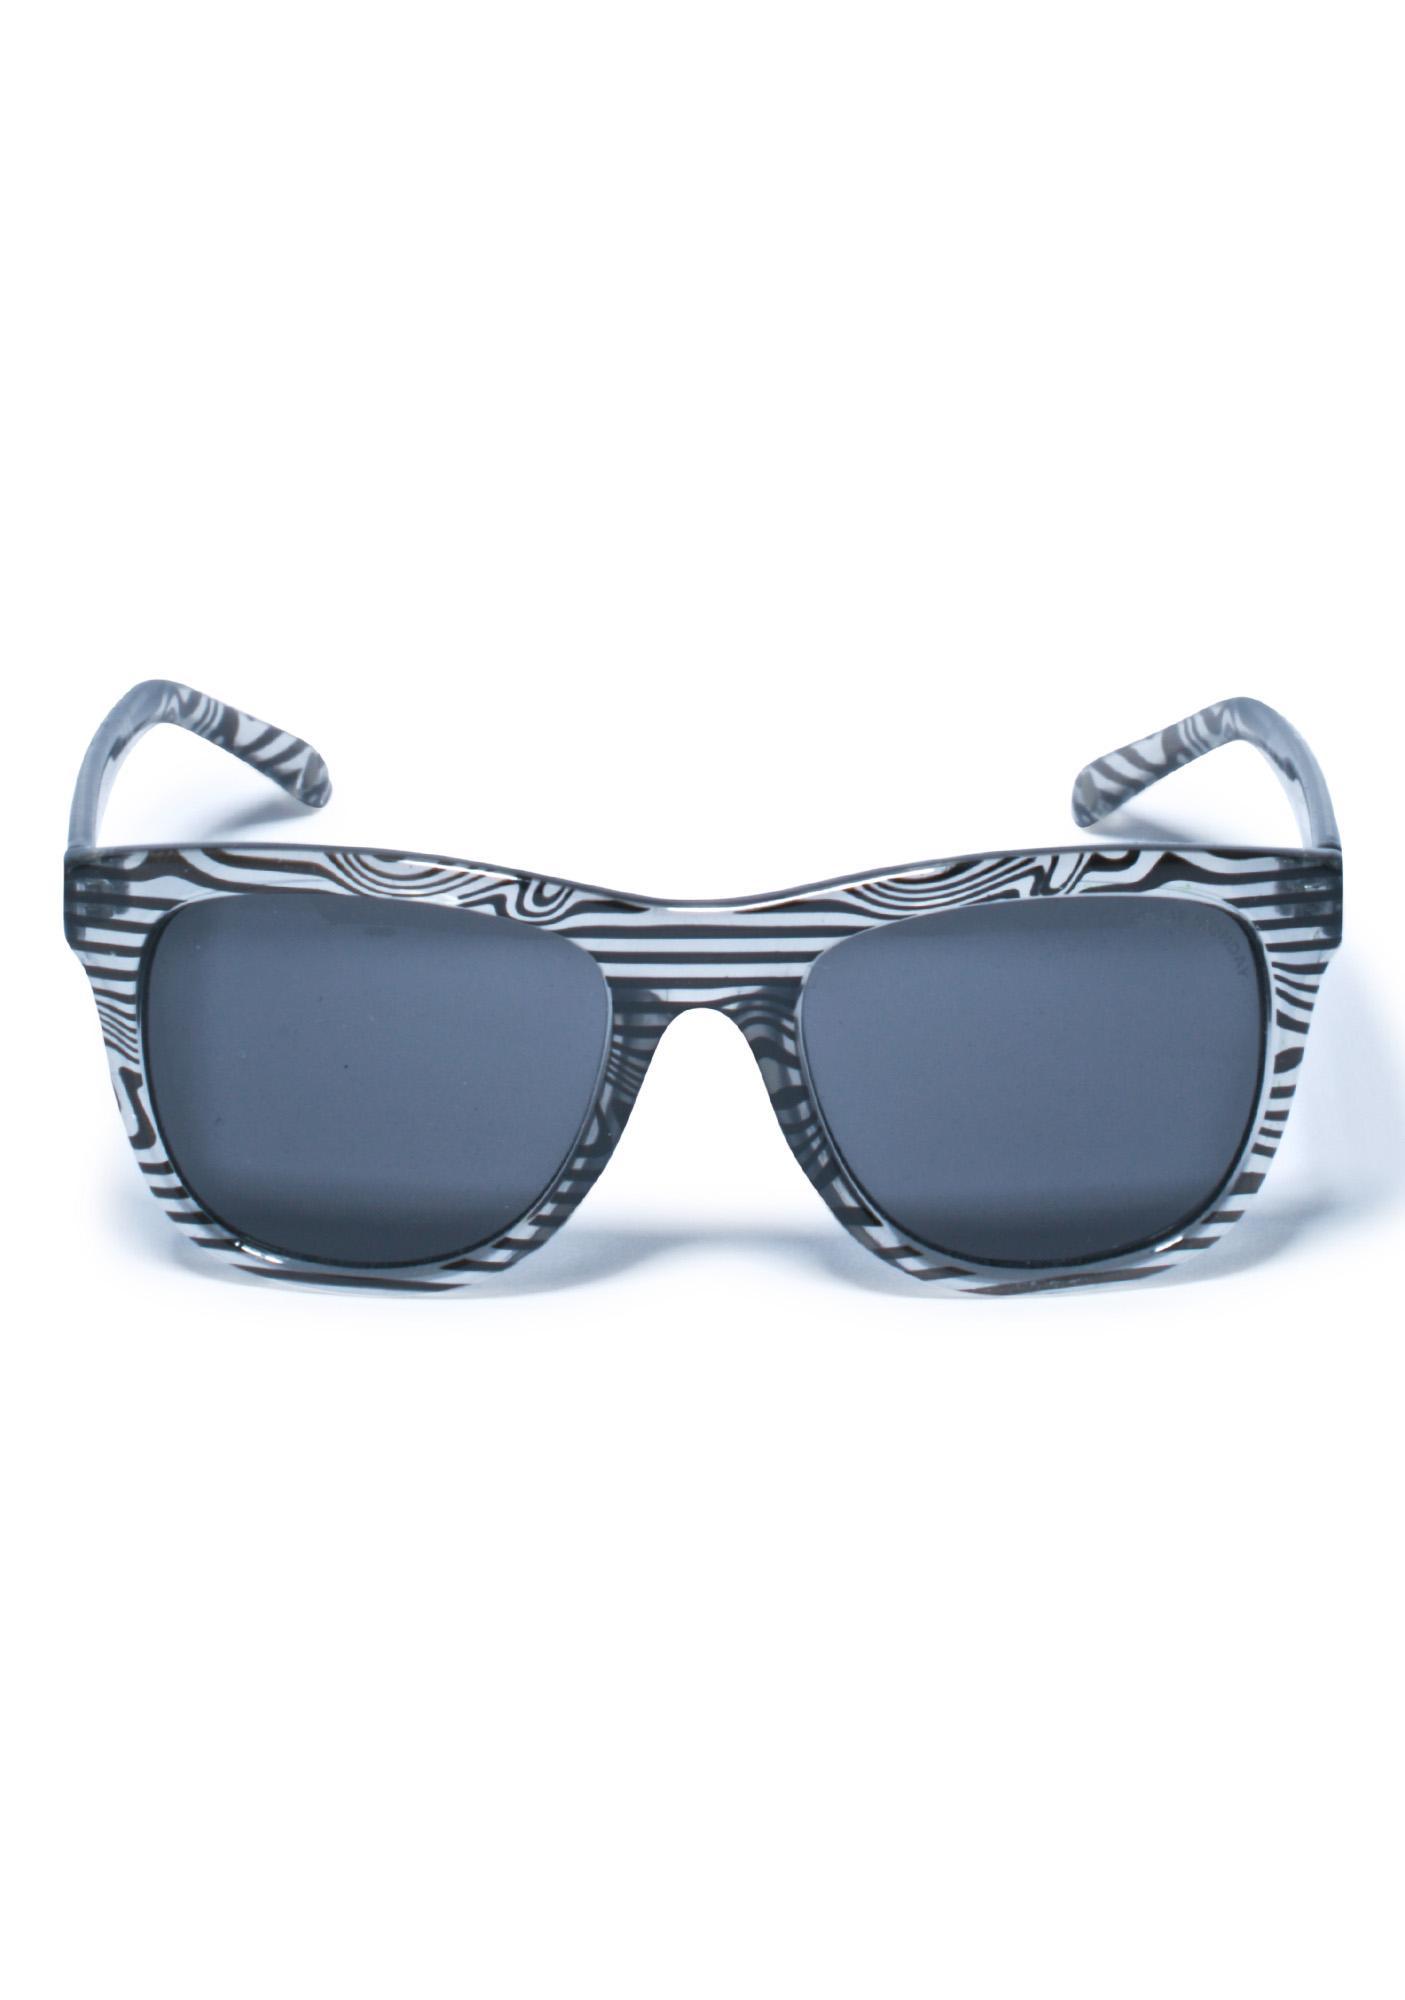 109b491da5 ... Cheap Monday Timeless Sunglasses